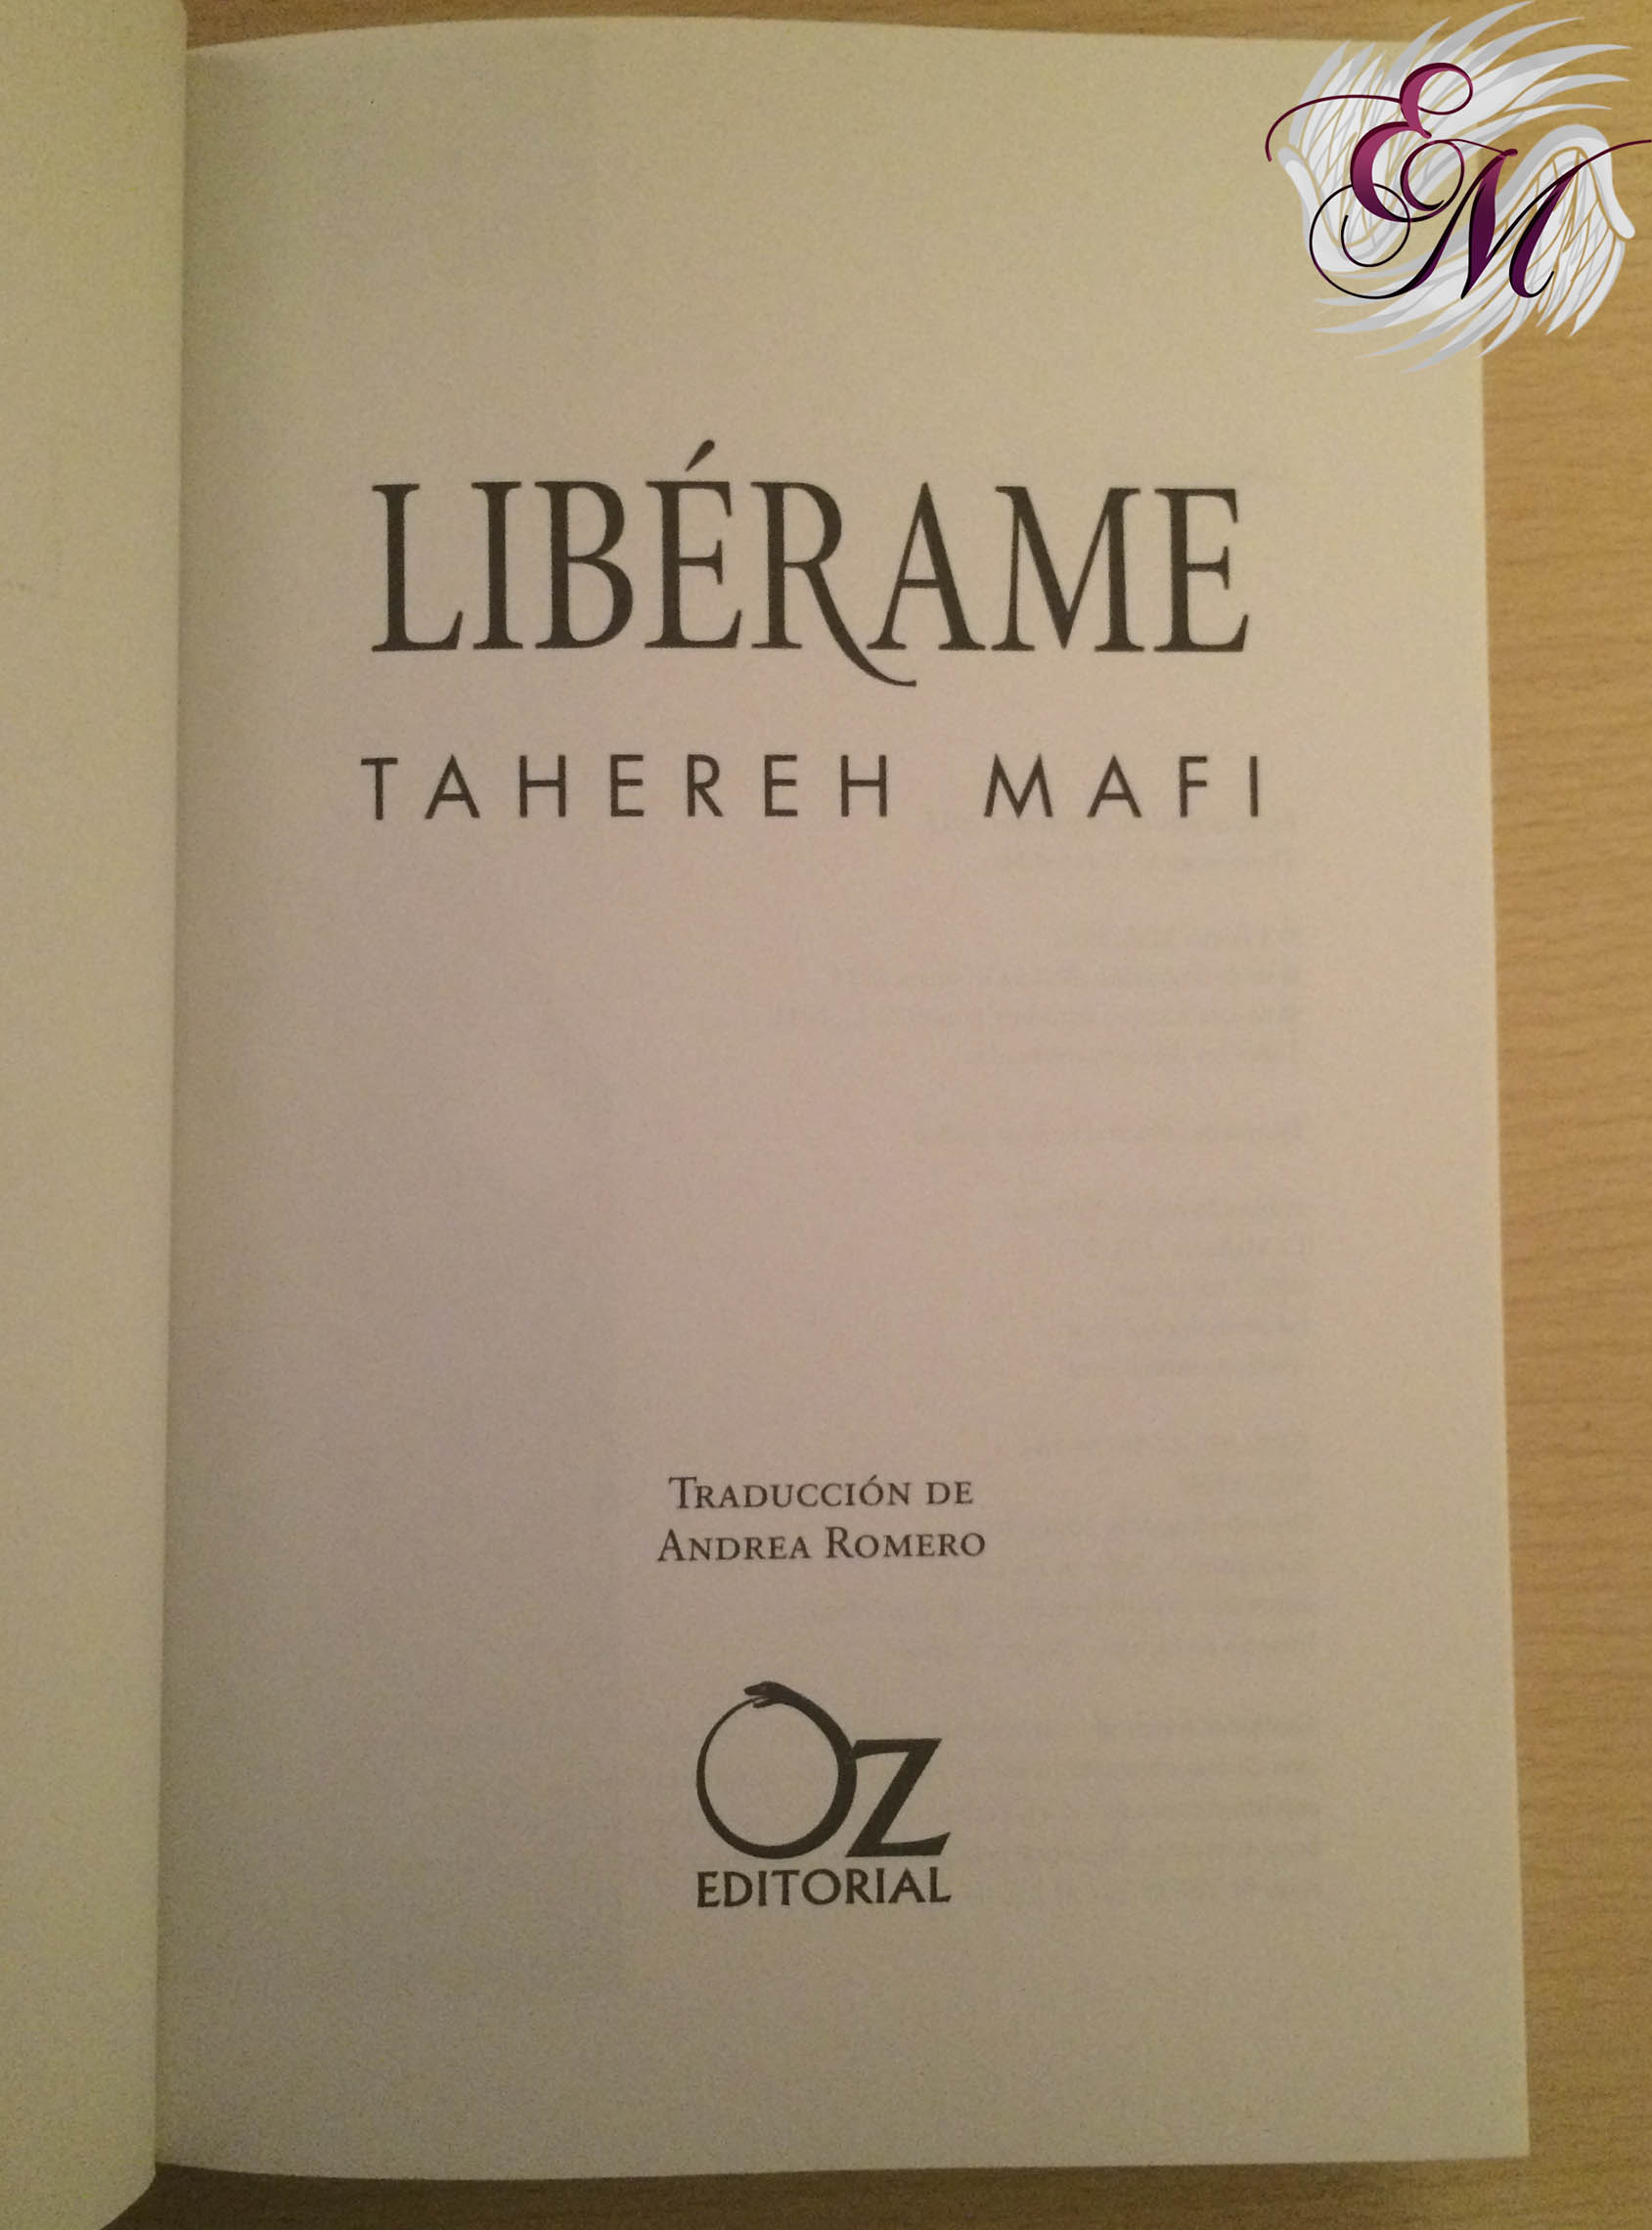 Libérame, de Tahereh Mafi - Reseña